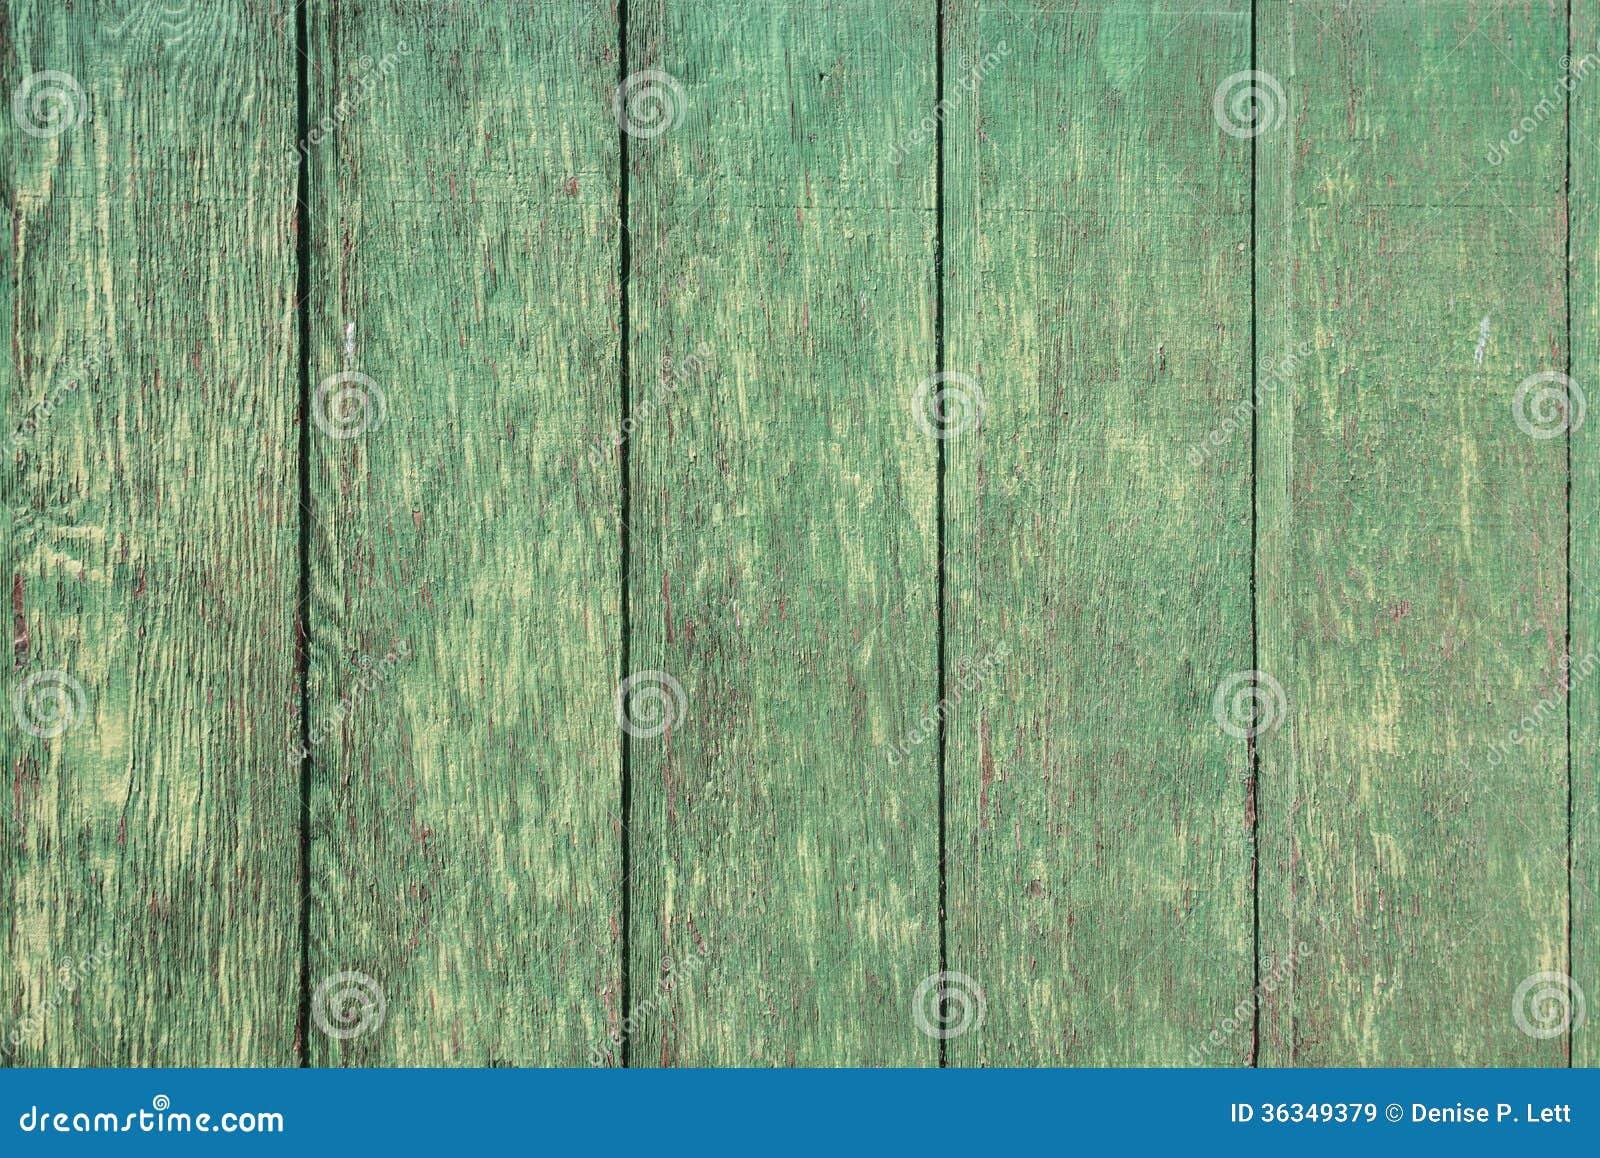 Weathered Green Wood Plank Background Stock Image Image